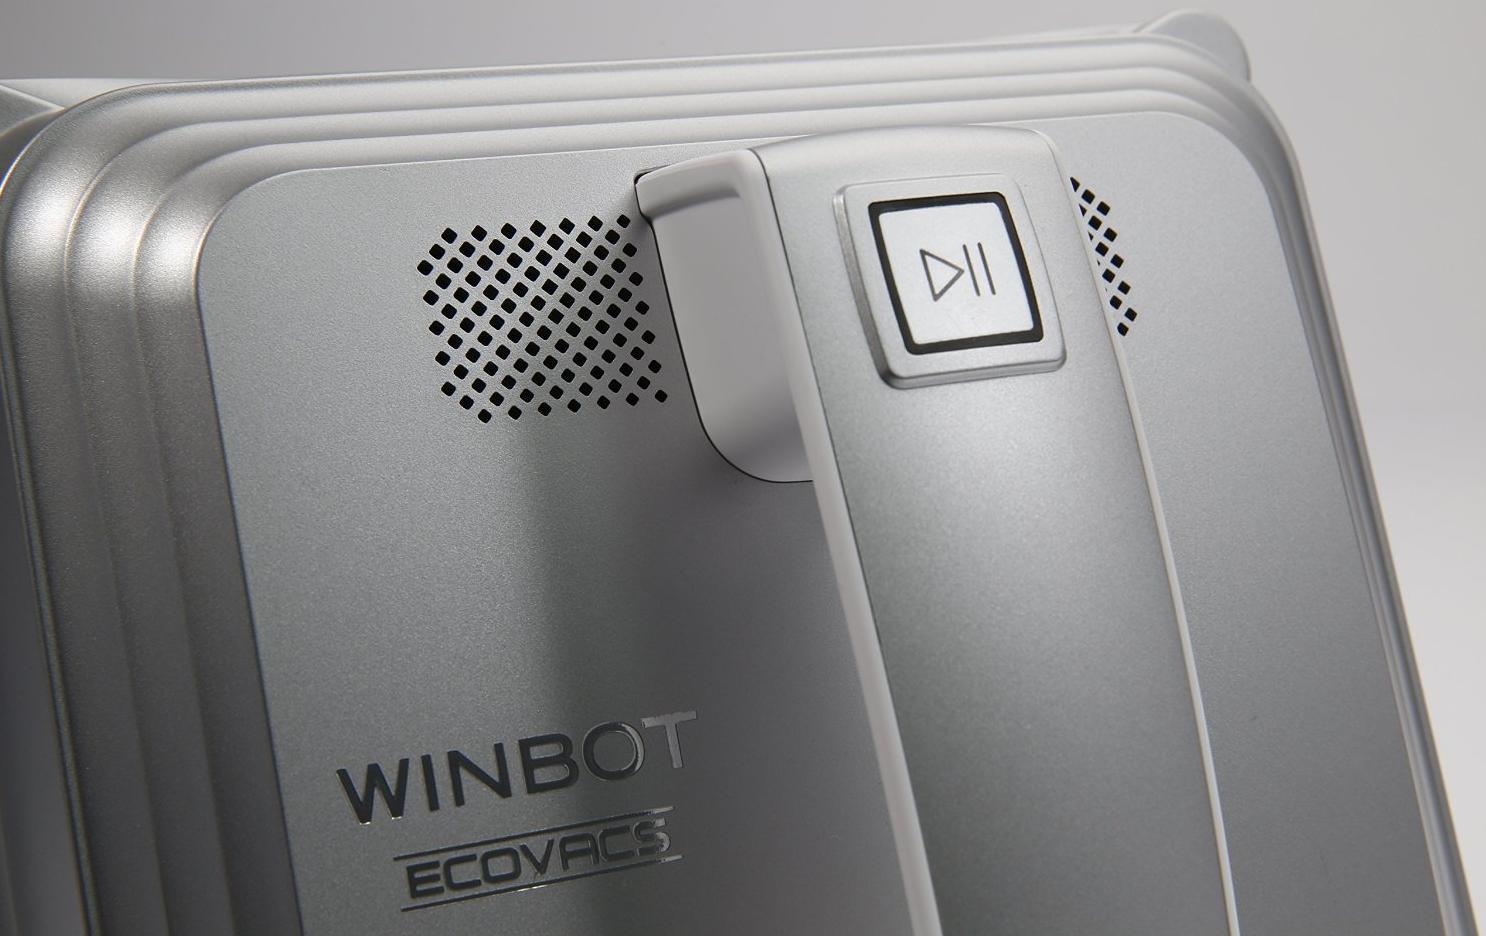 ivo grandi pr myslov vysava e vysava e isti e ecovacs winbot w830 robotick isti. Black Bedroom Furniture Sets. Home Design Ideas